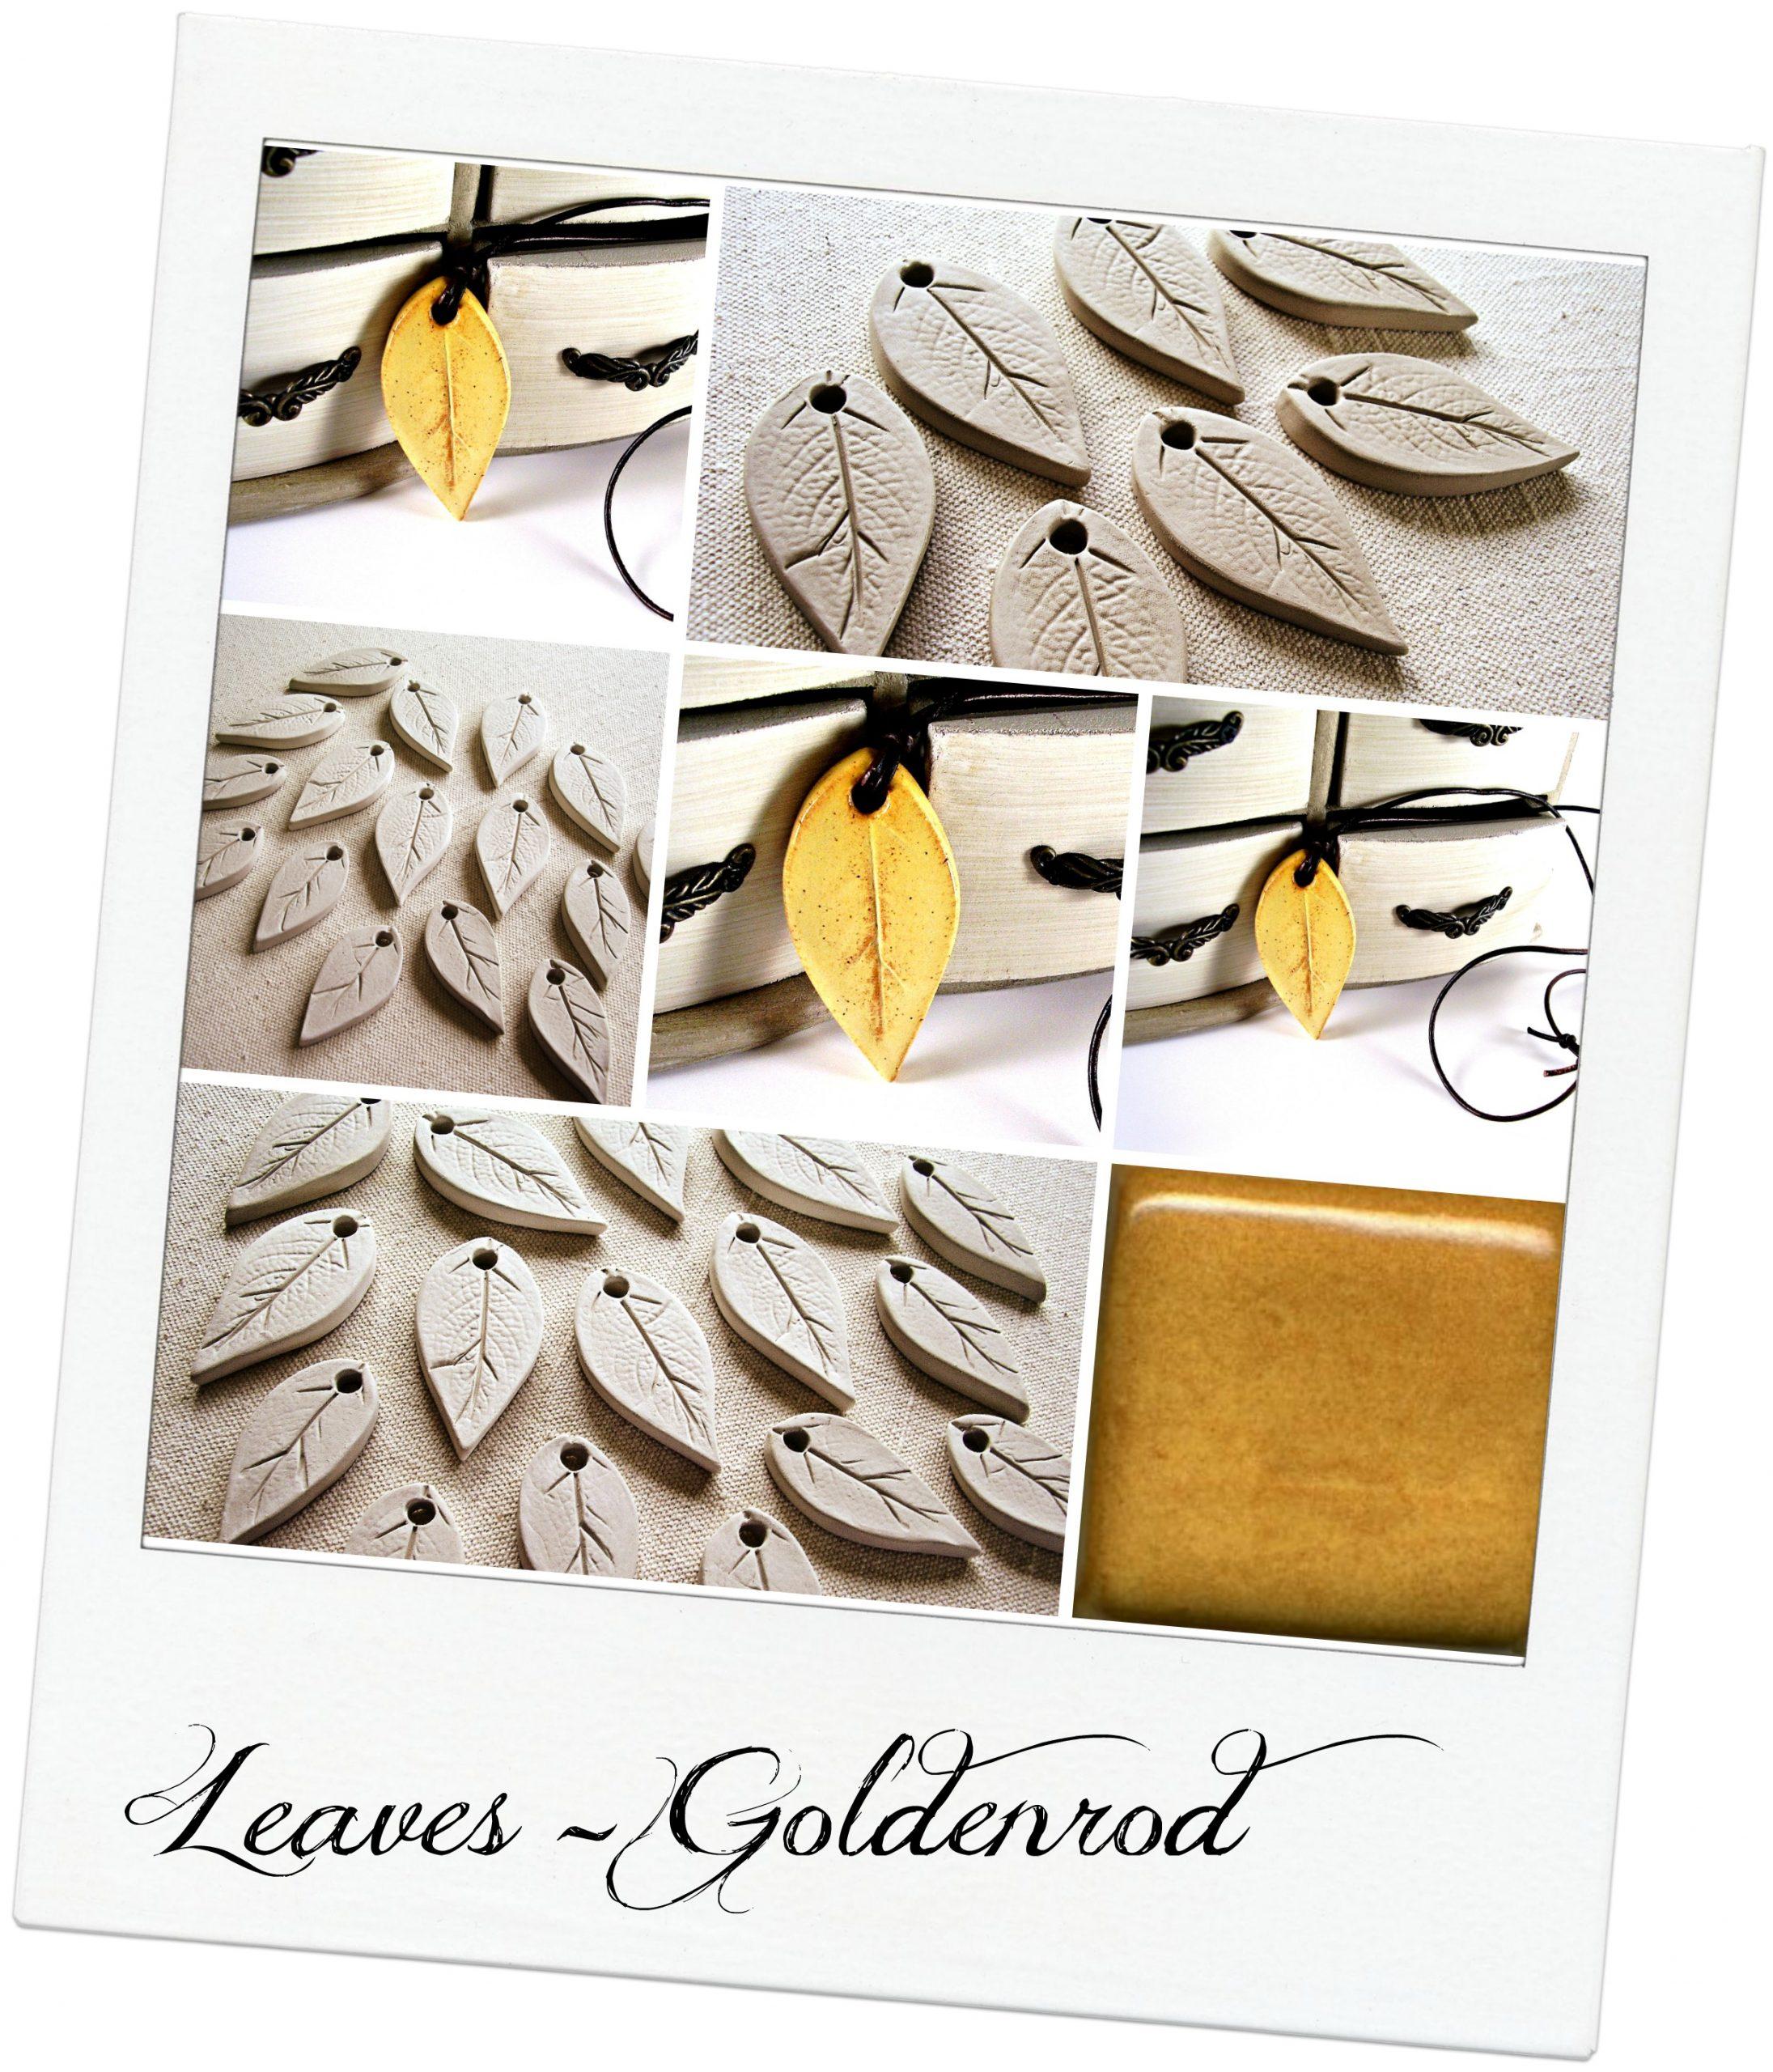 ceramic leaves goldenrod2 with textjpg